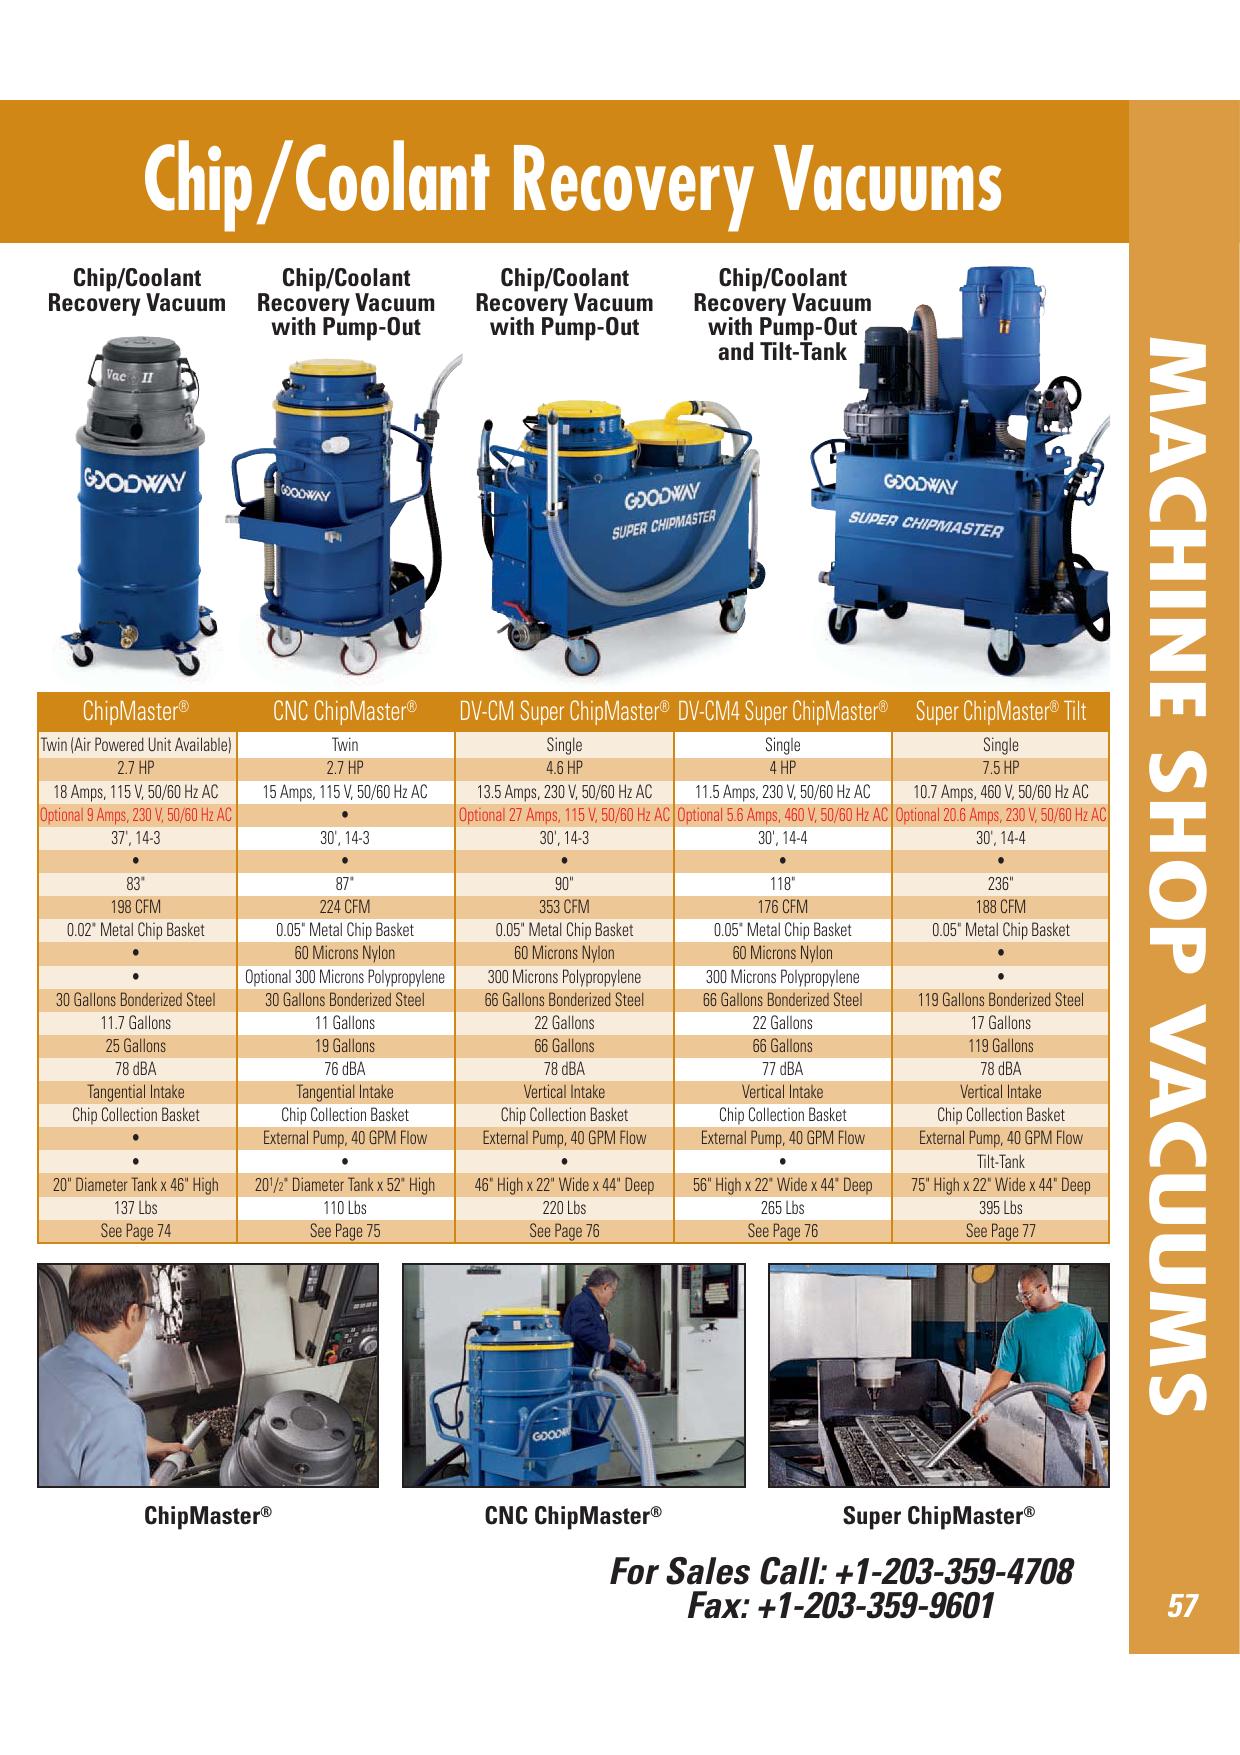 Chip/Coolant Recovery Vacuums | manualzz com